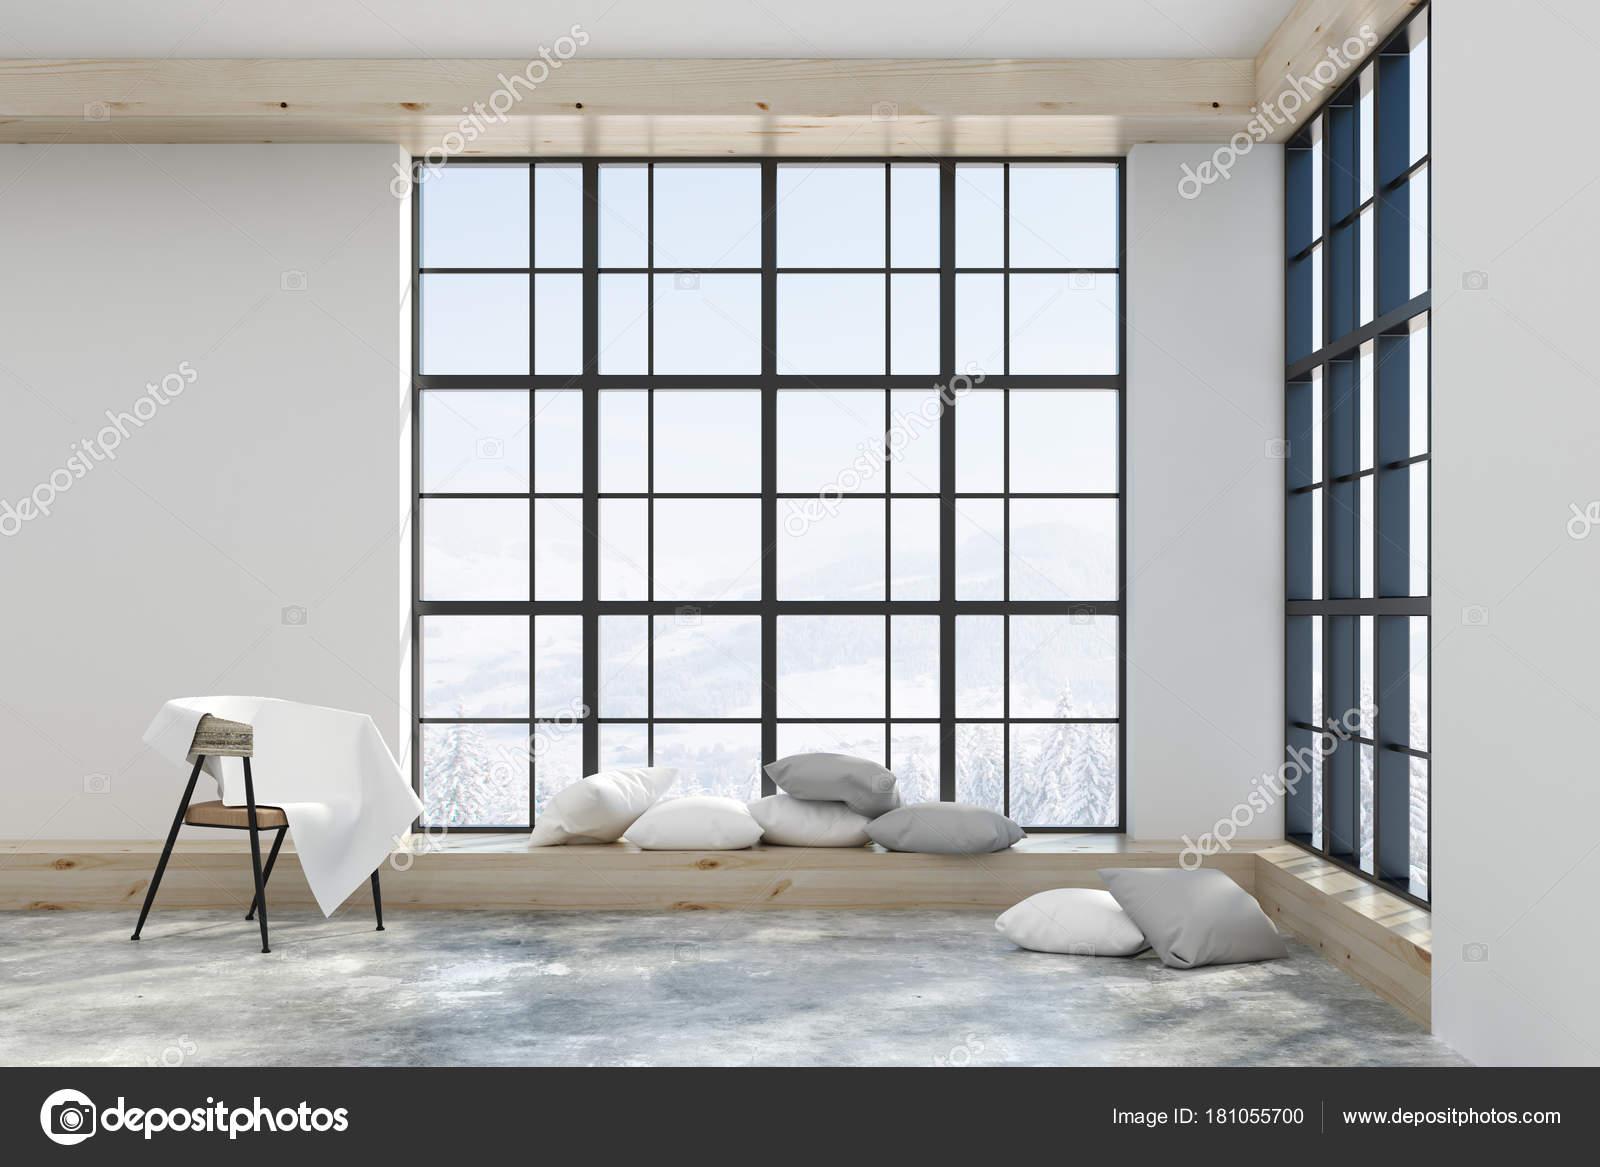 Modern interieur met decoratie artikelen u stockfoto peshkova